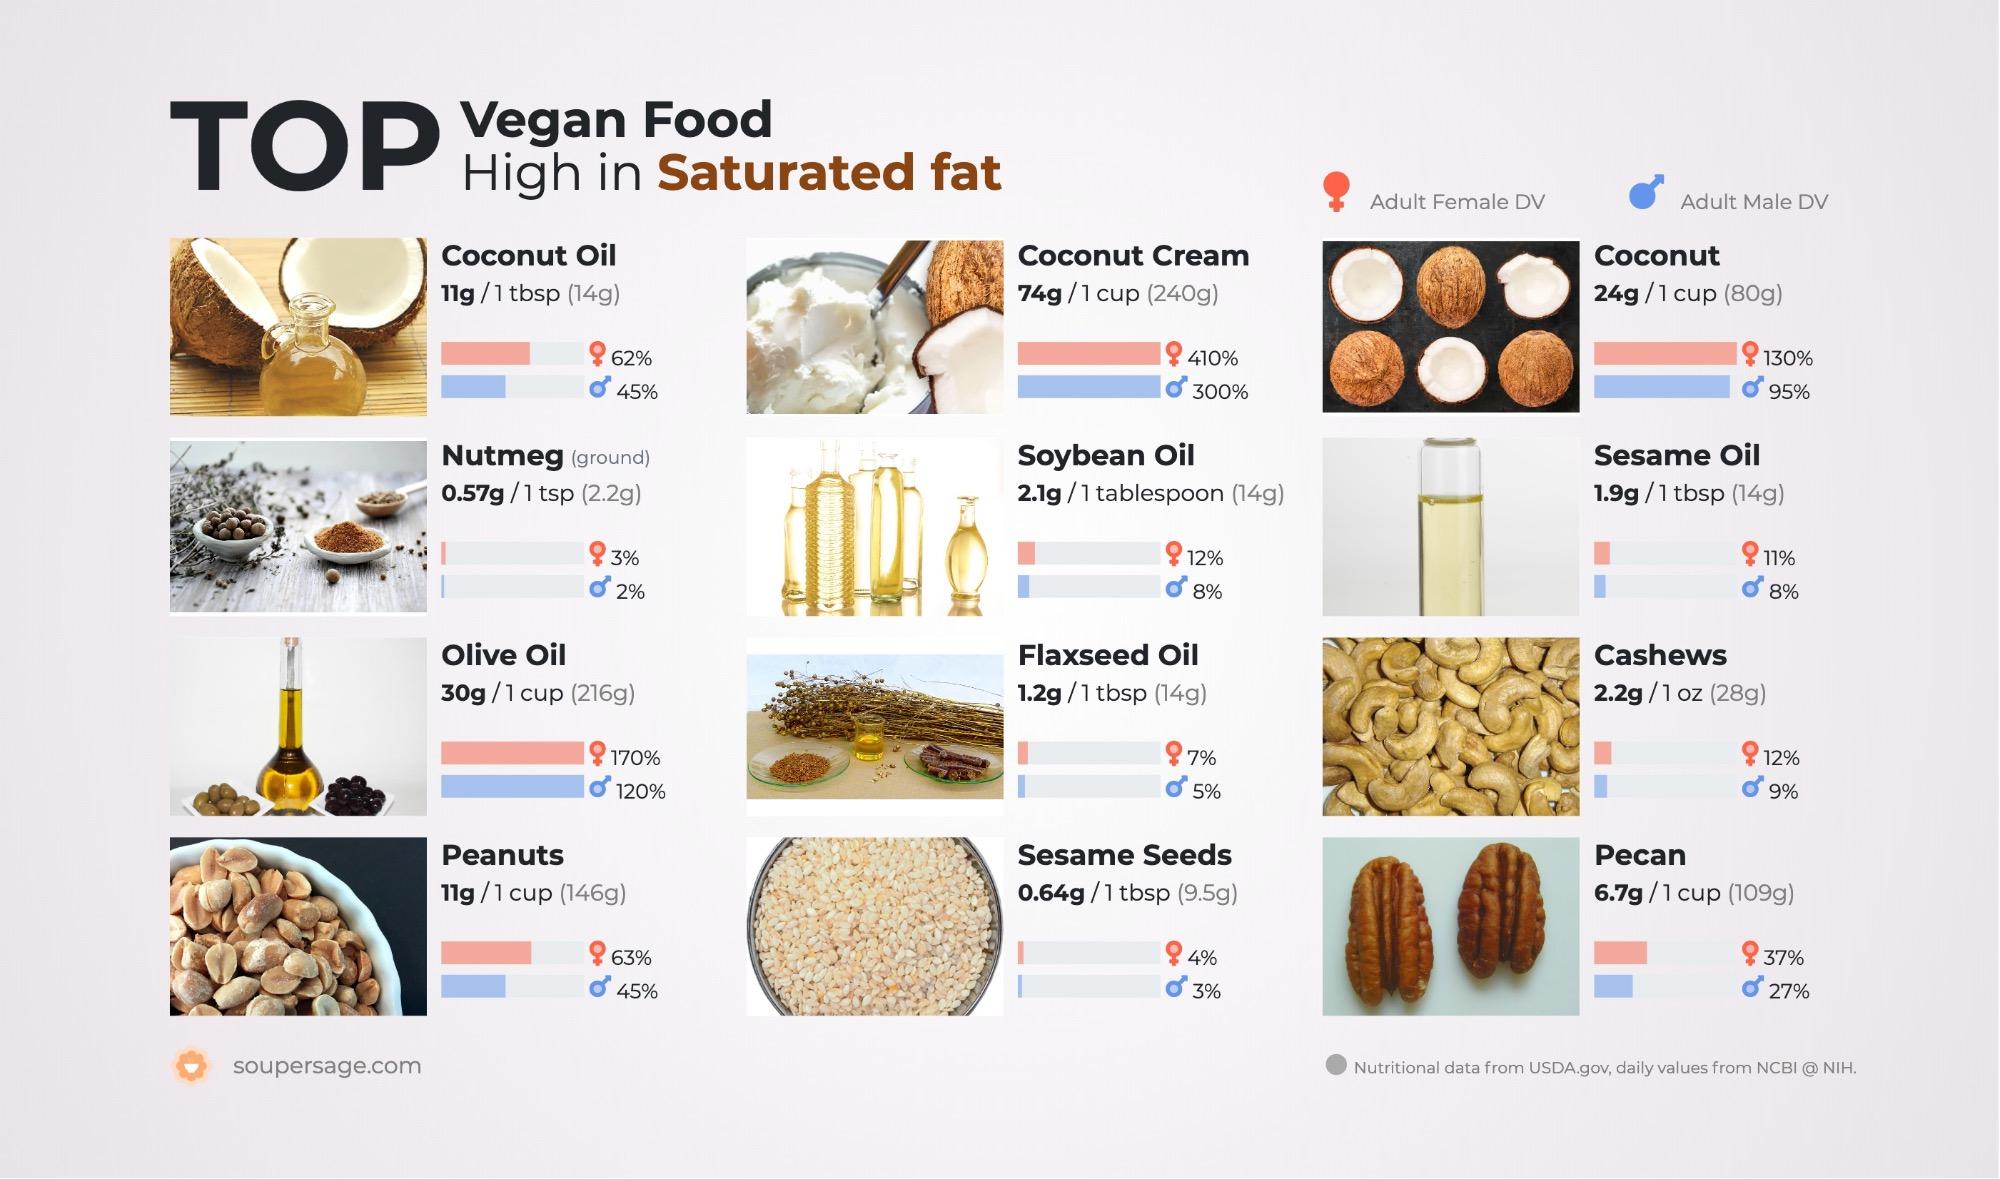 image of Top Vegan Food High in Saturated fat